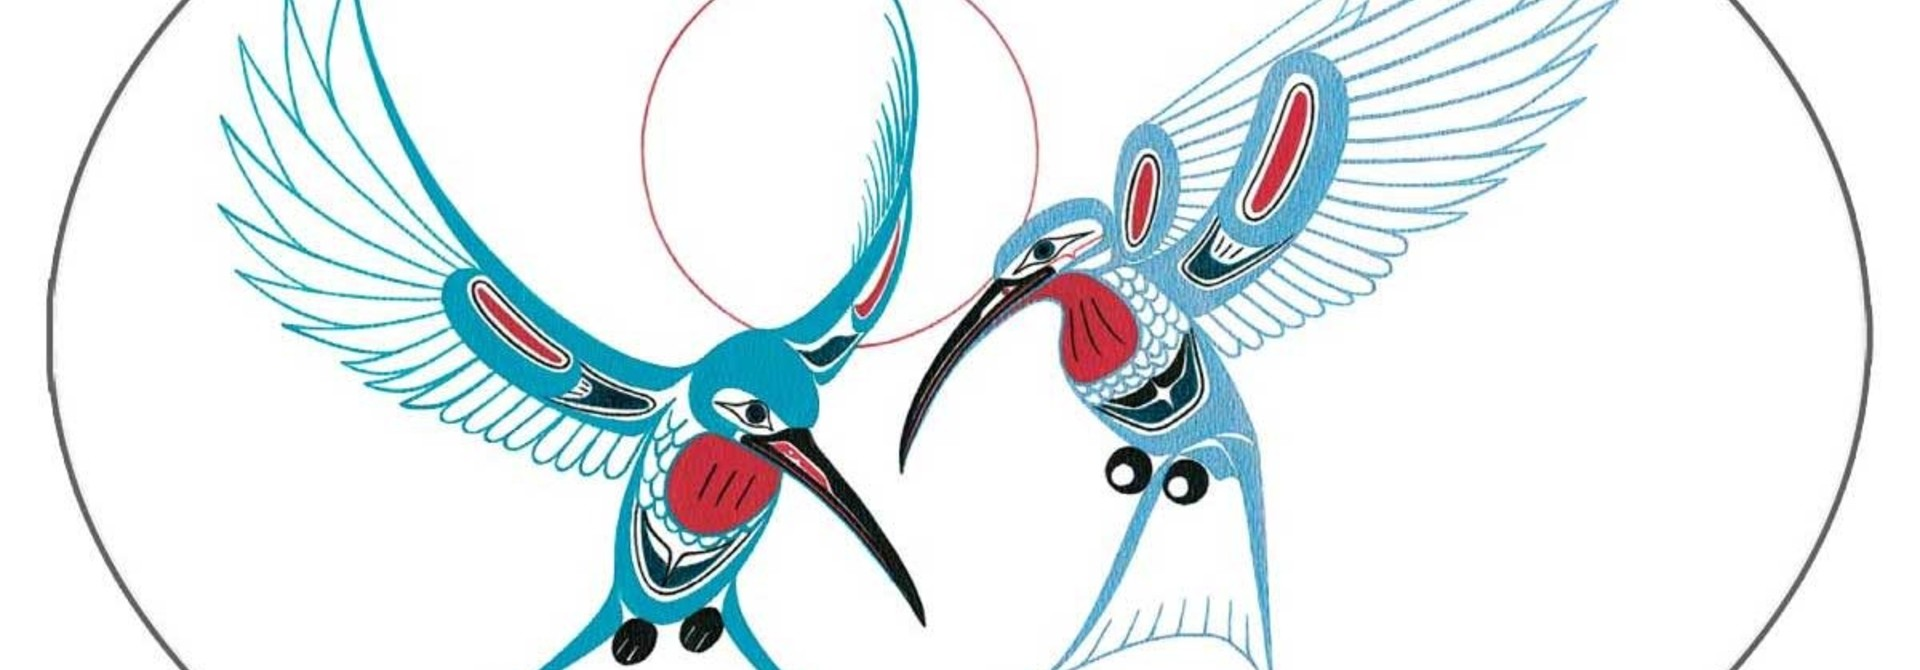 "5""x3.5"" Sticker hummingbird-Richard Shorty"